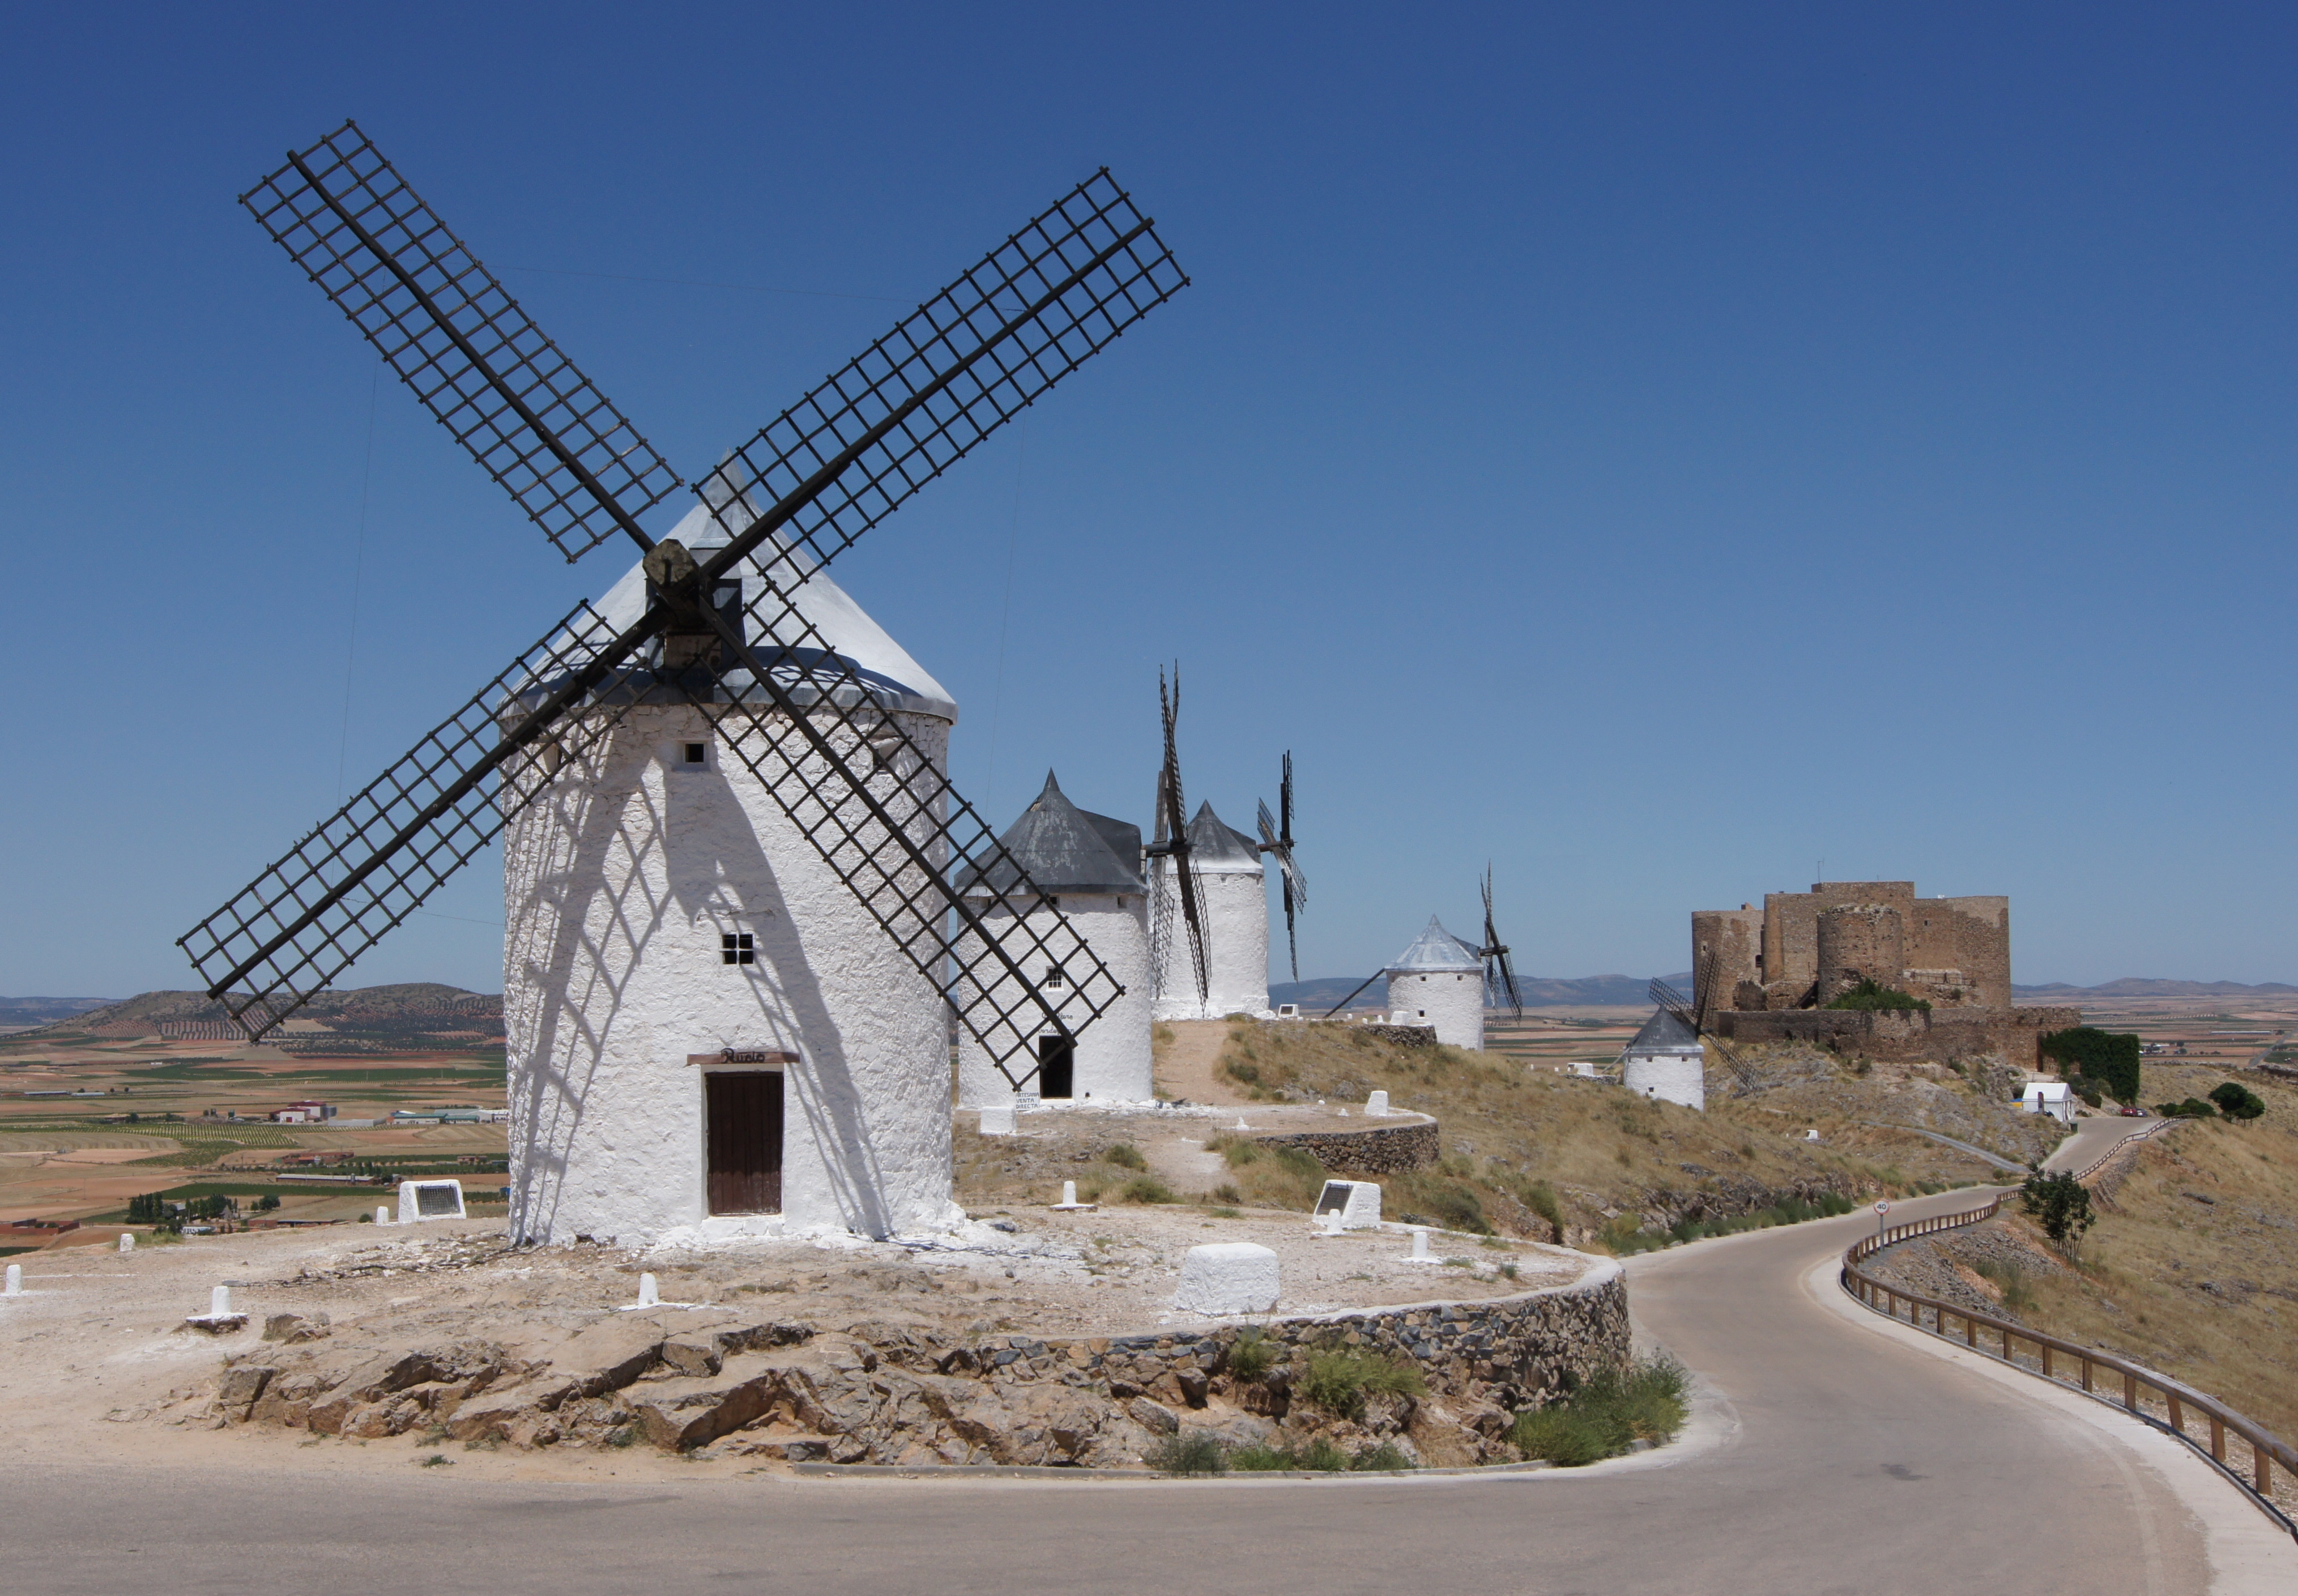 File:Moulins La Mancha.jpg - Wikimedia Commons